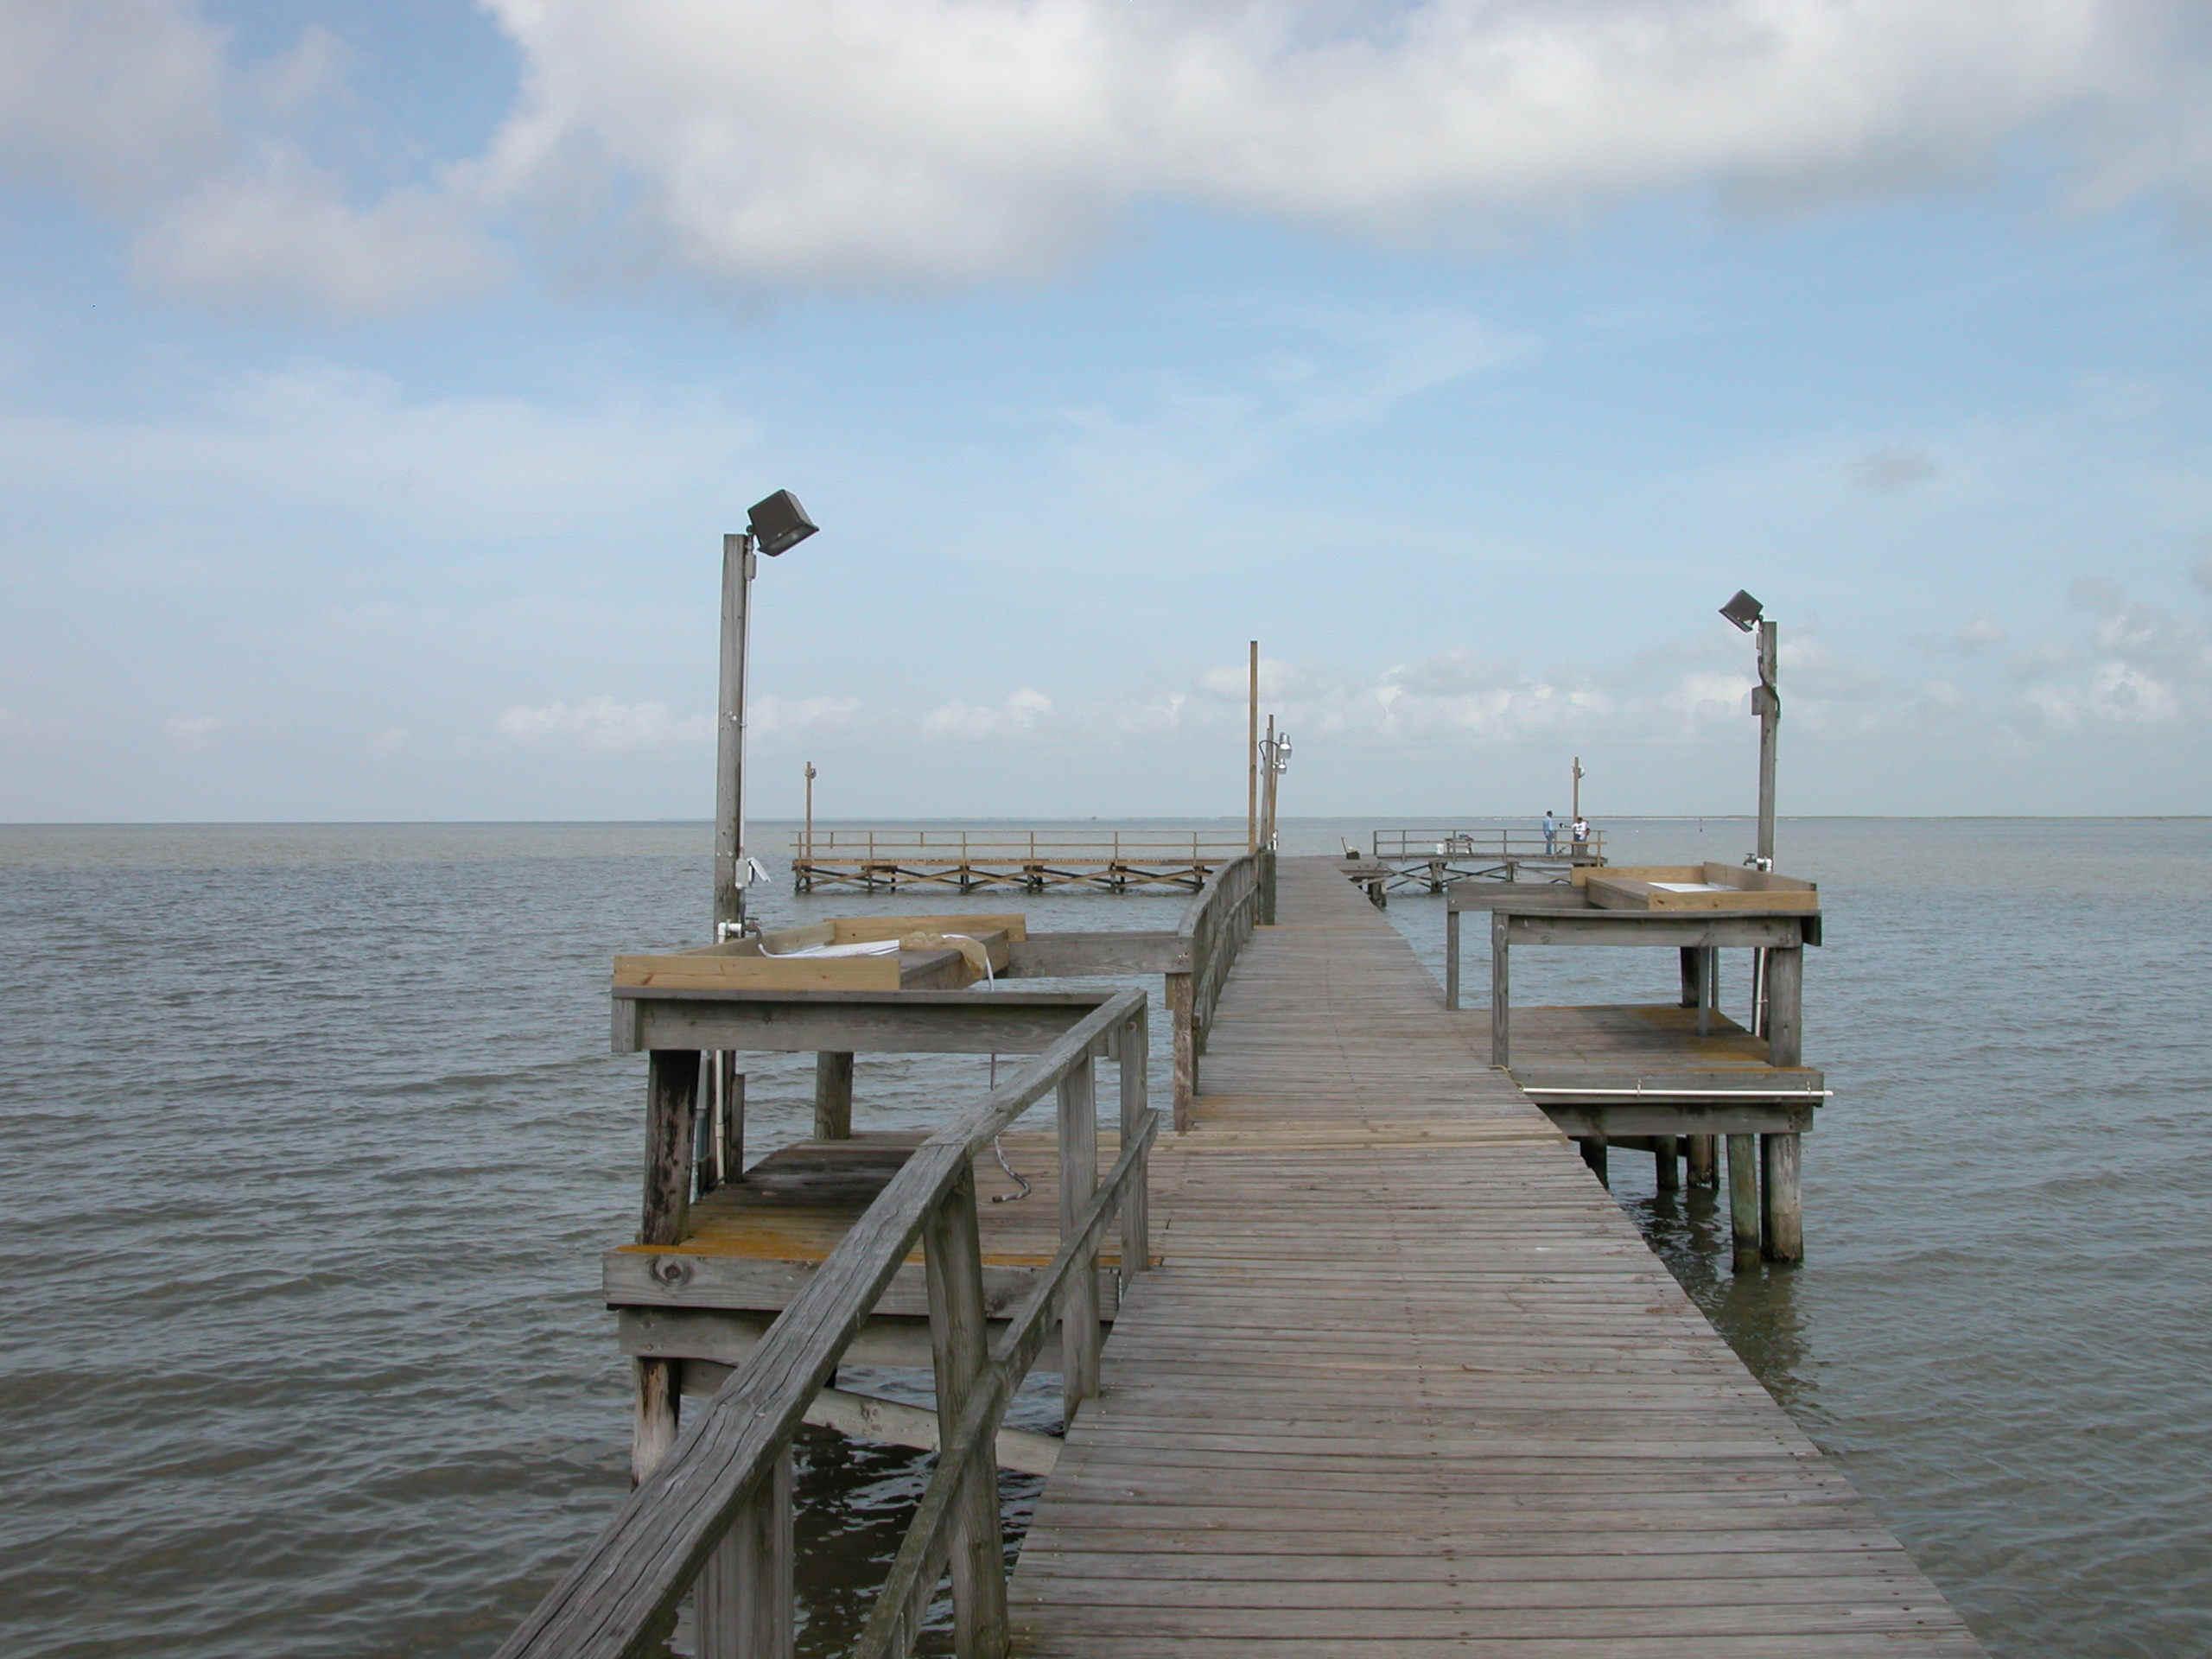 Pier photo